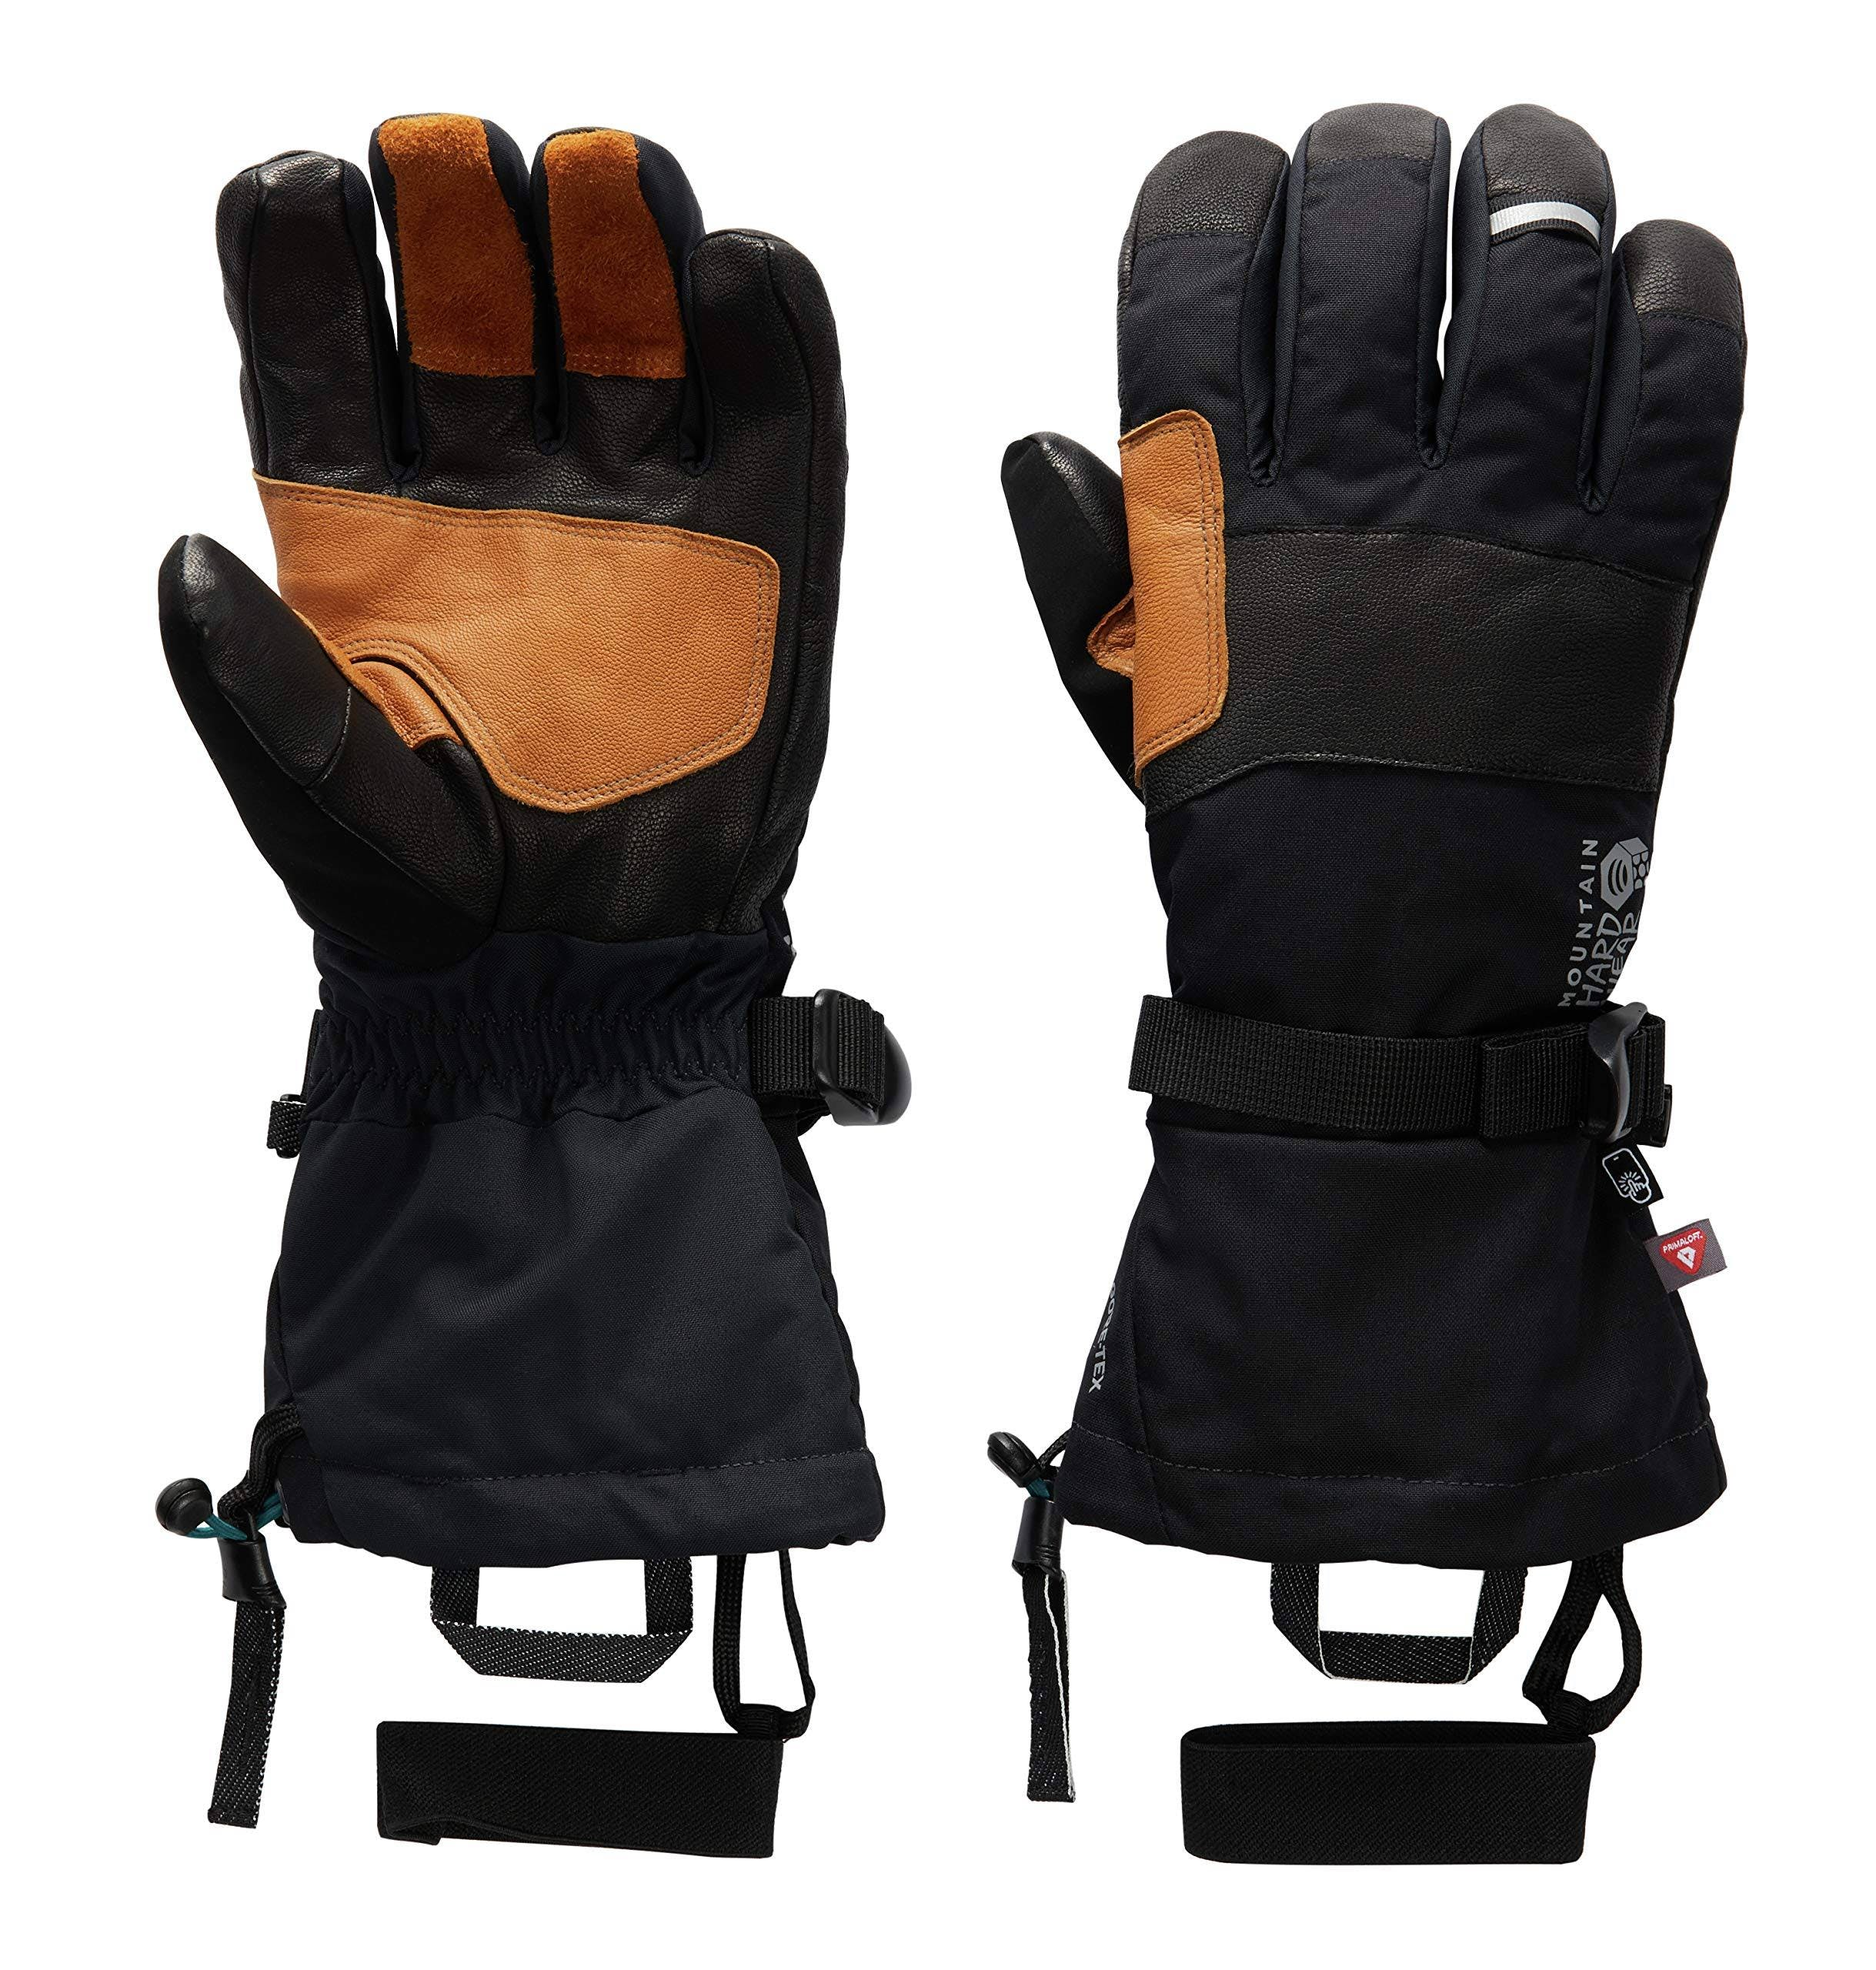 Mountain Hardwear Men's High Exposure GORE-TEX Glove S Black